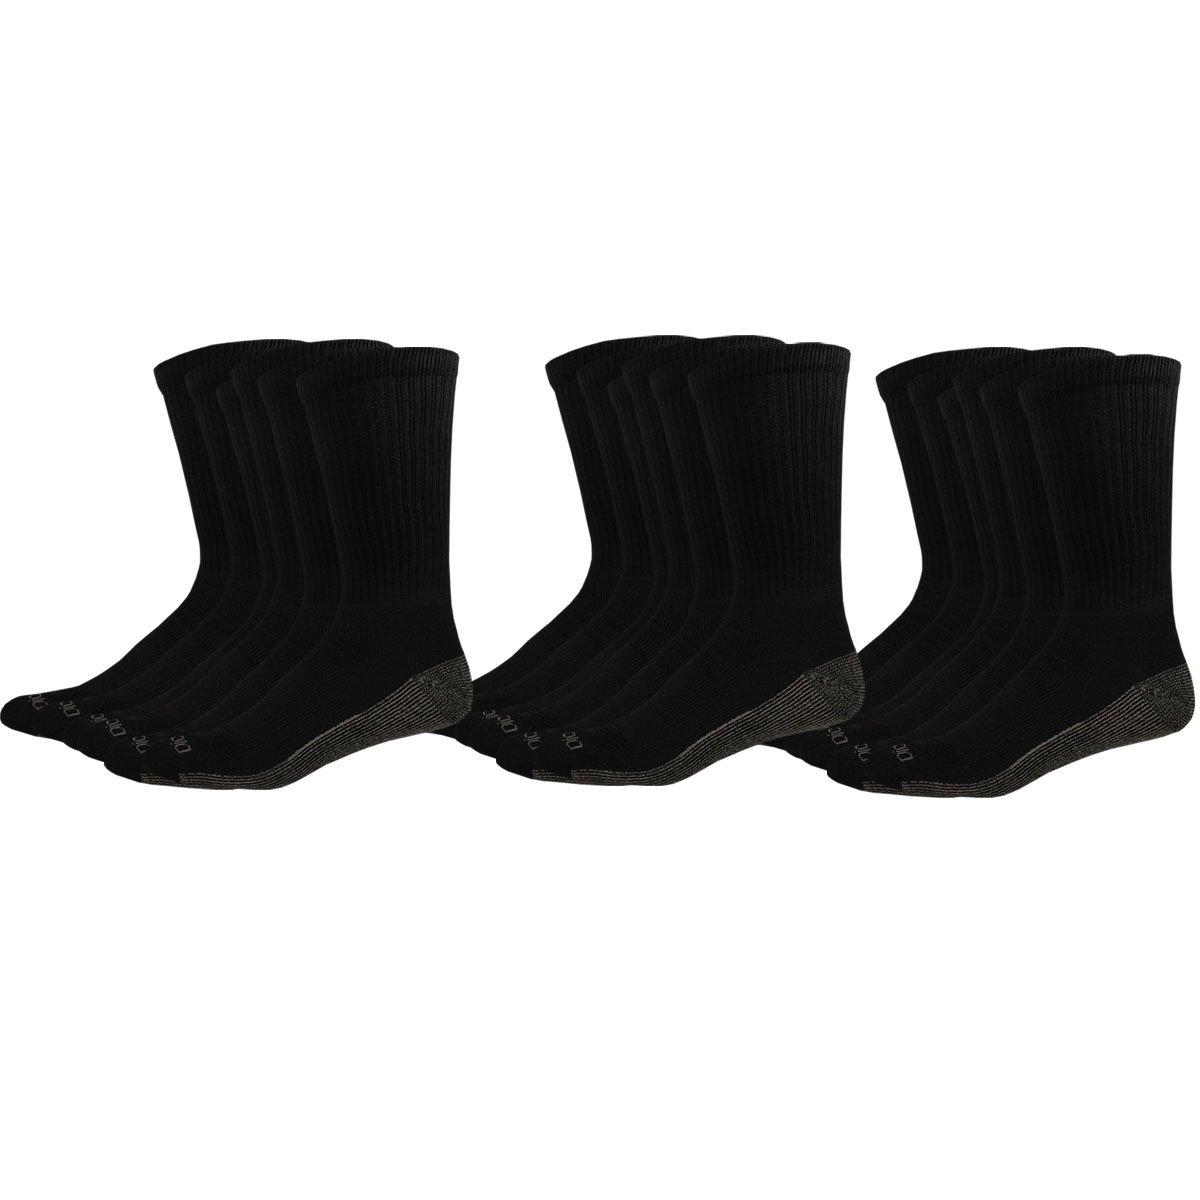 Dickies Men's Multi-Pack Dri-Tech Moisture Control Crew, Black 18 Pack, Sock Size: 10-13/Shoe Size: 6-12